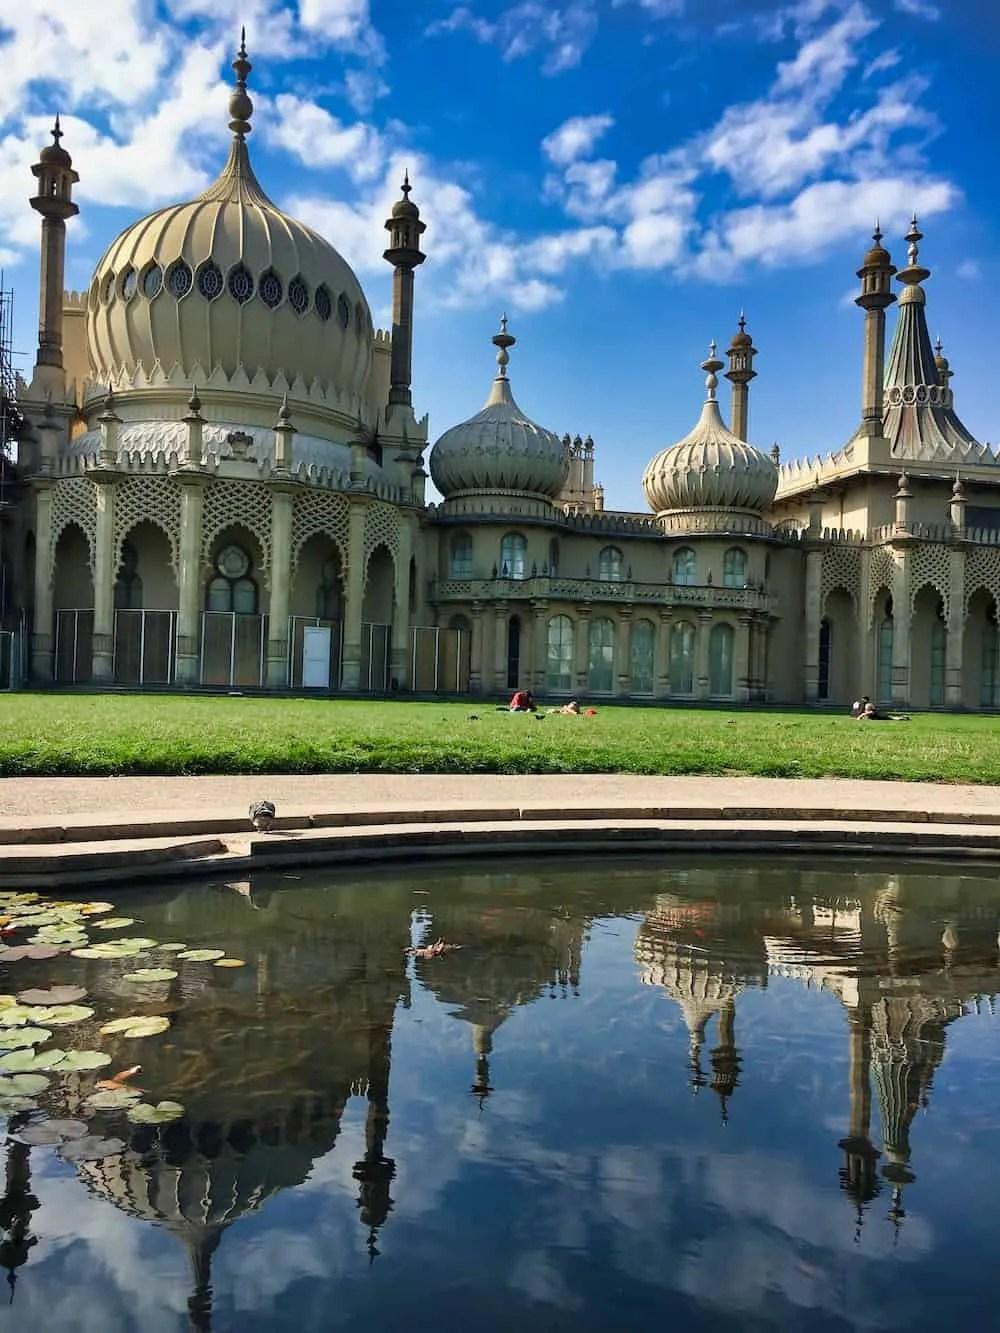 On the Brighton Pavilion Grounds